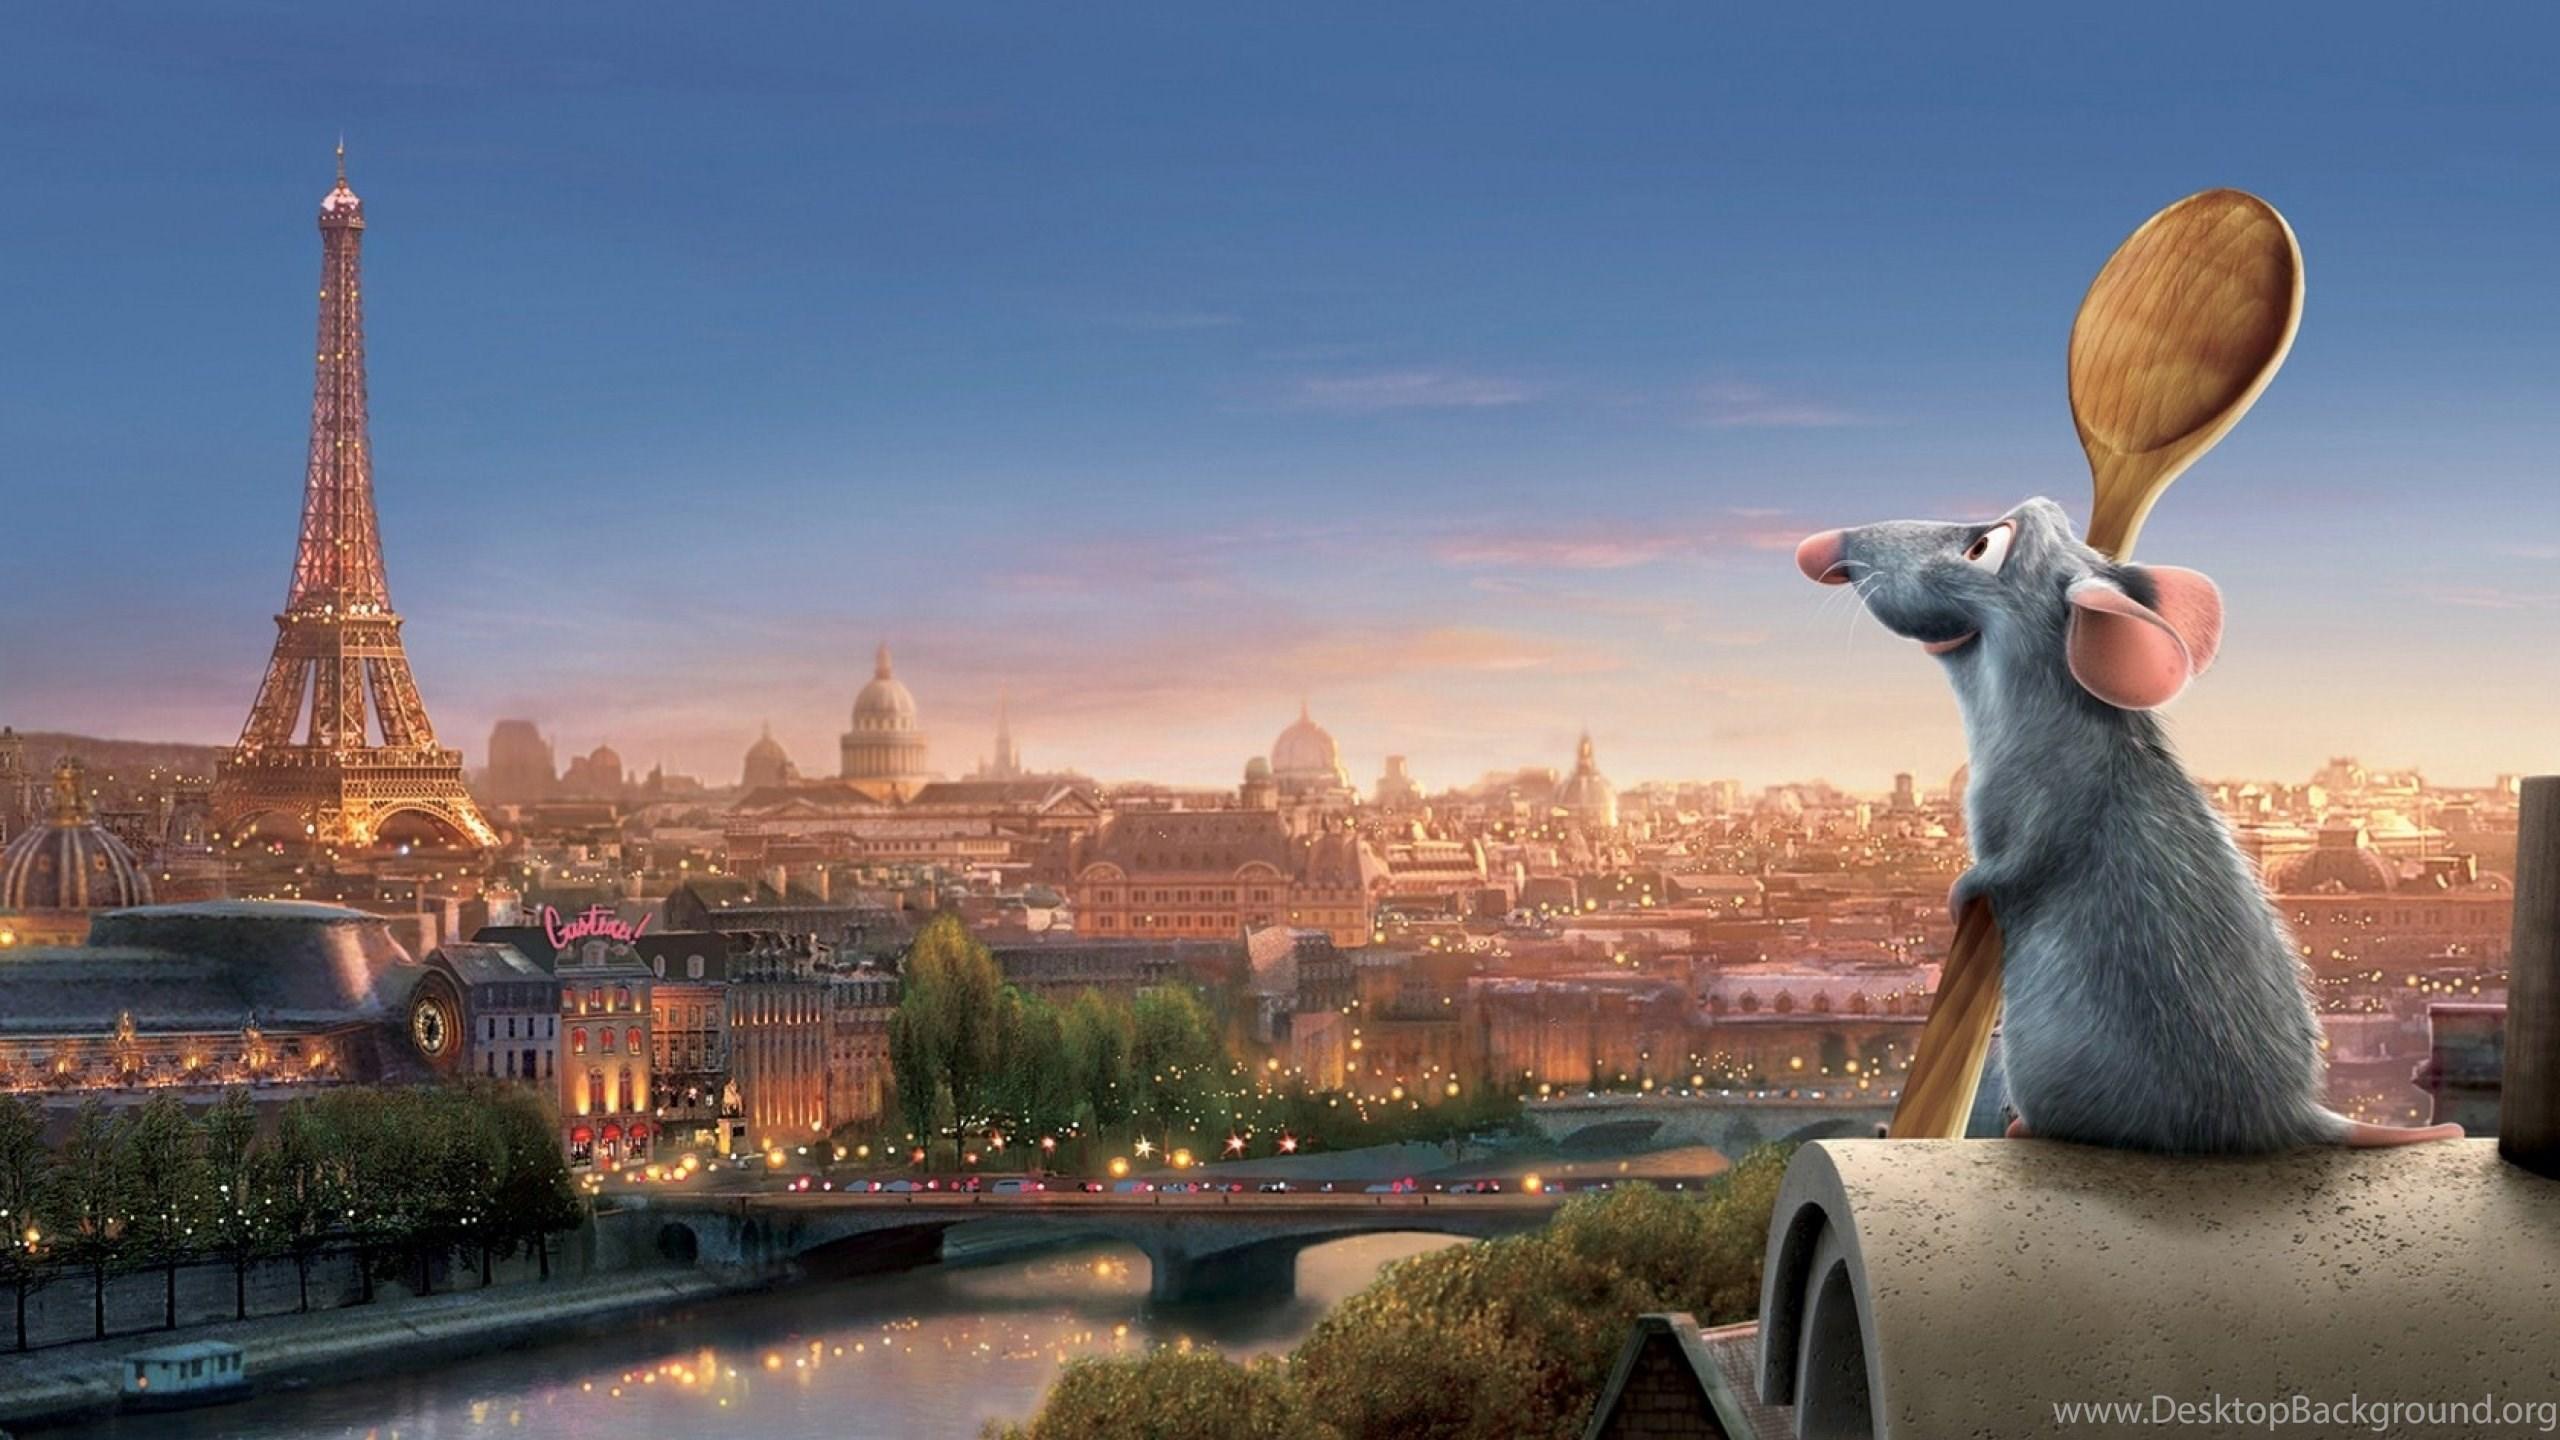 download wallpapers, download 2560x1600 pixar movies ratatouille